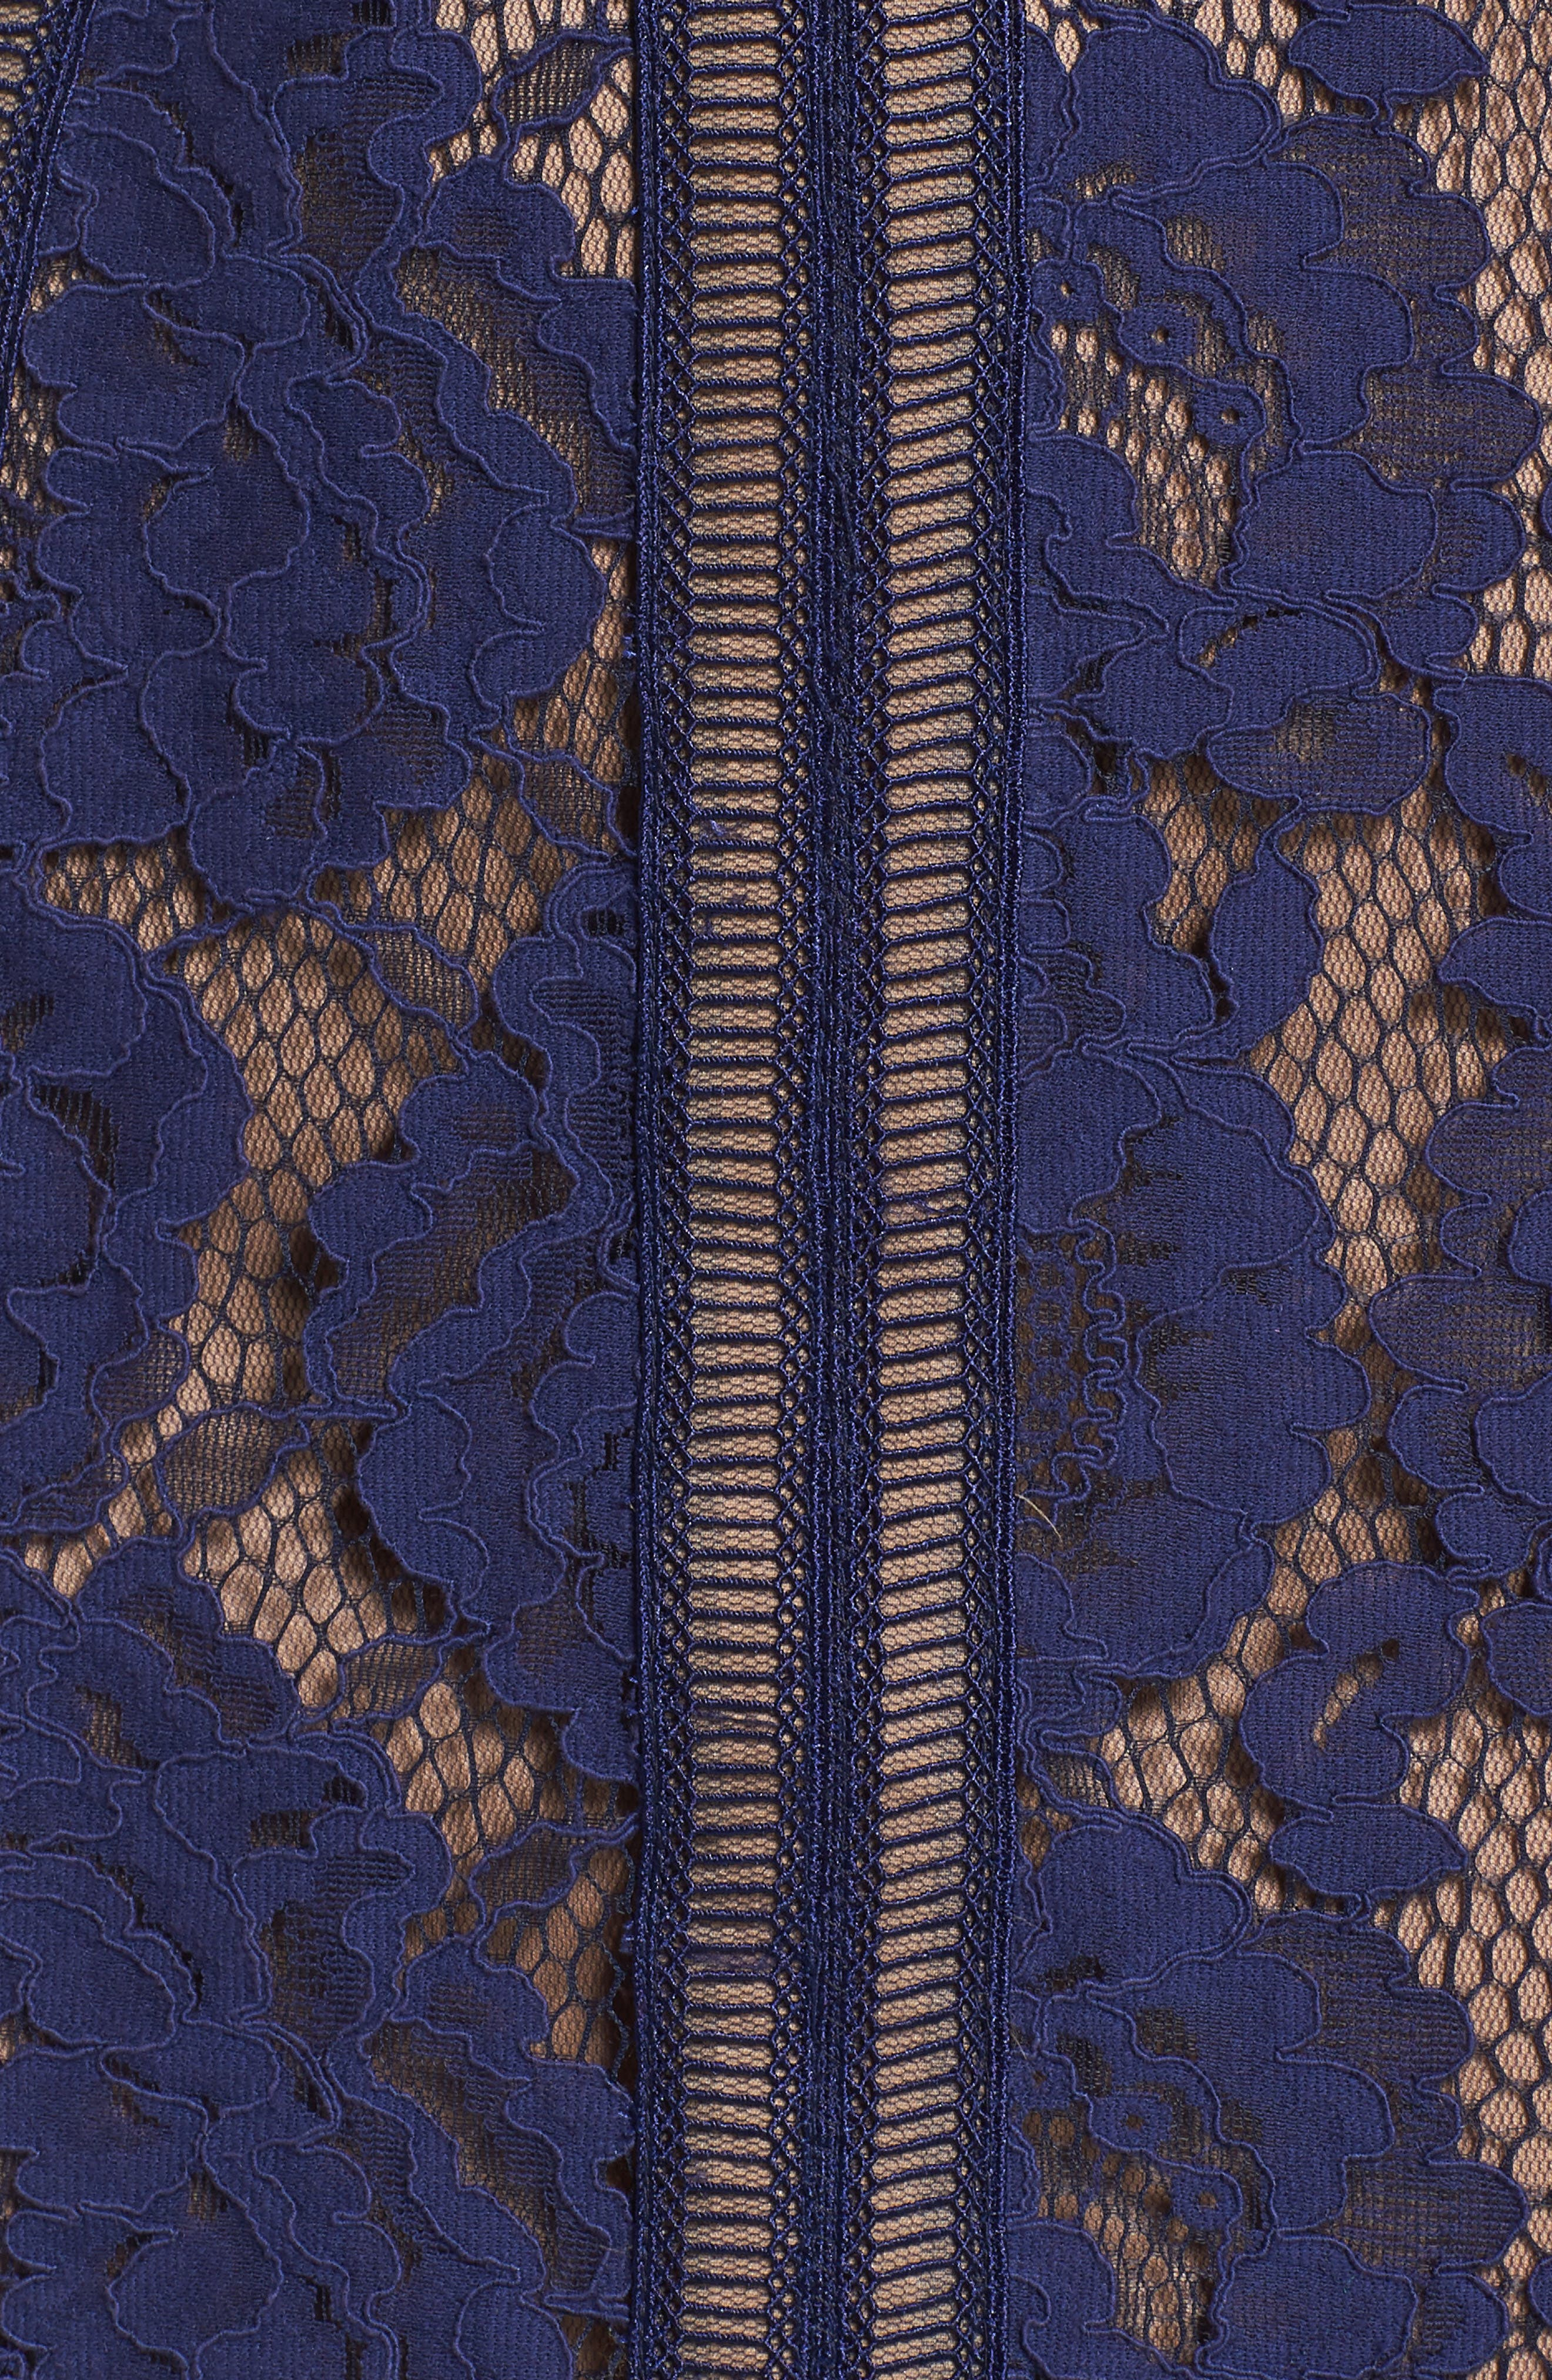 Lace Sheath Dress,                             Alternate thumbnail 5, color,                             Notte/ Nude